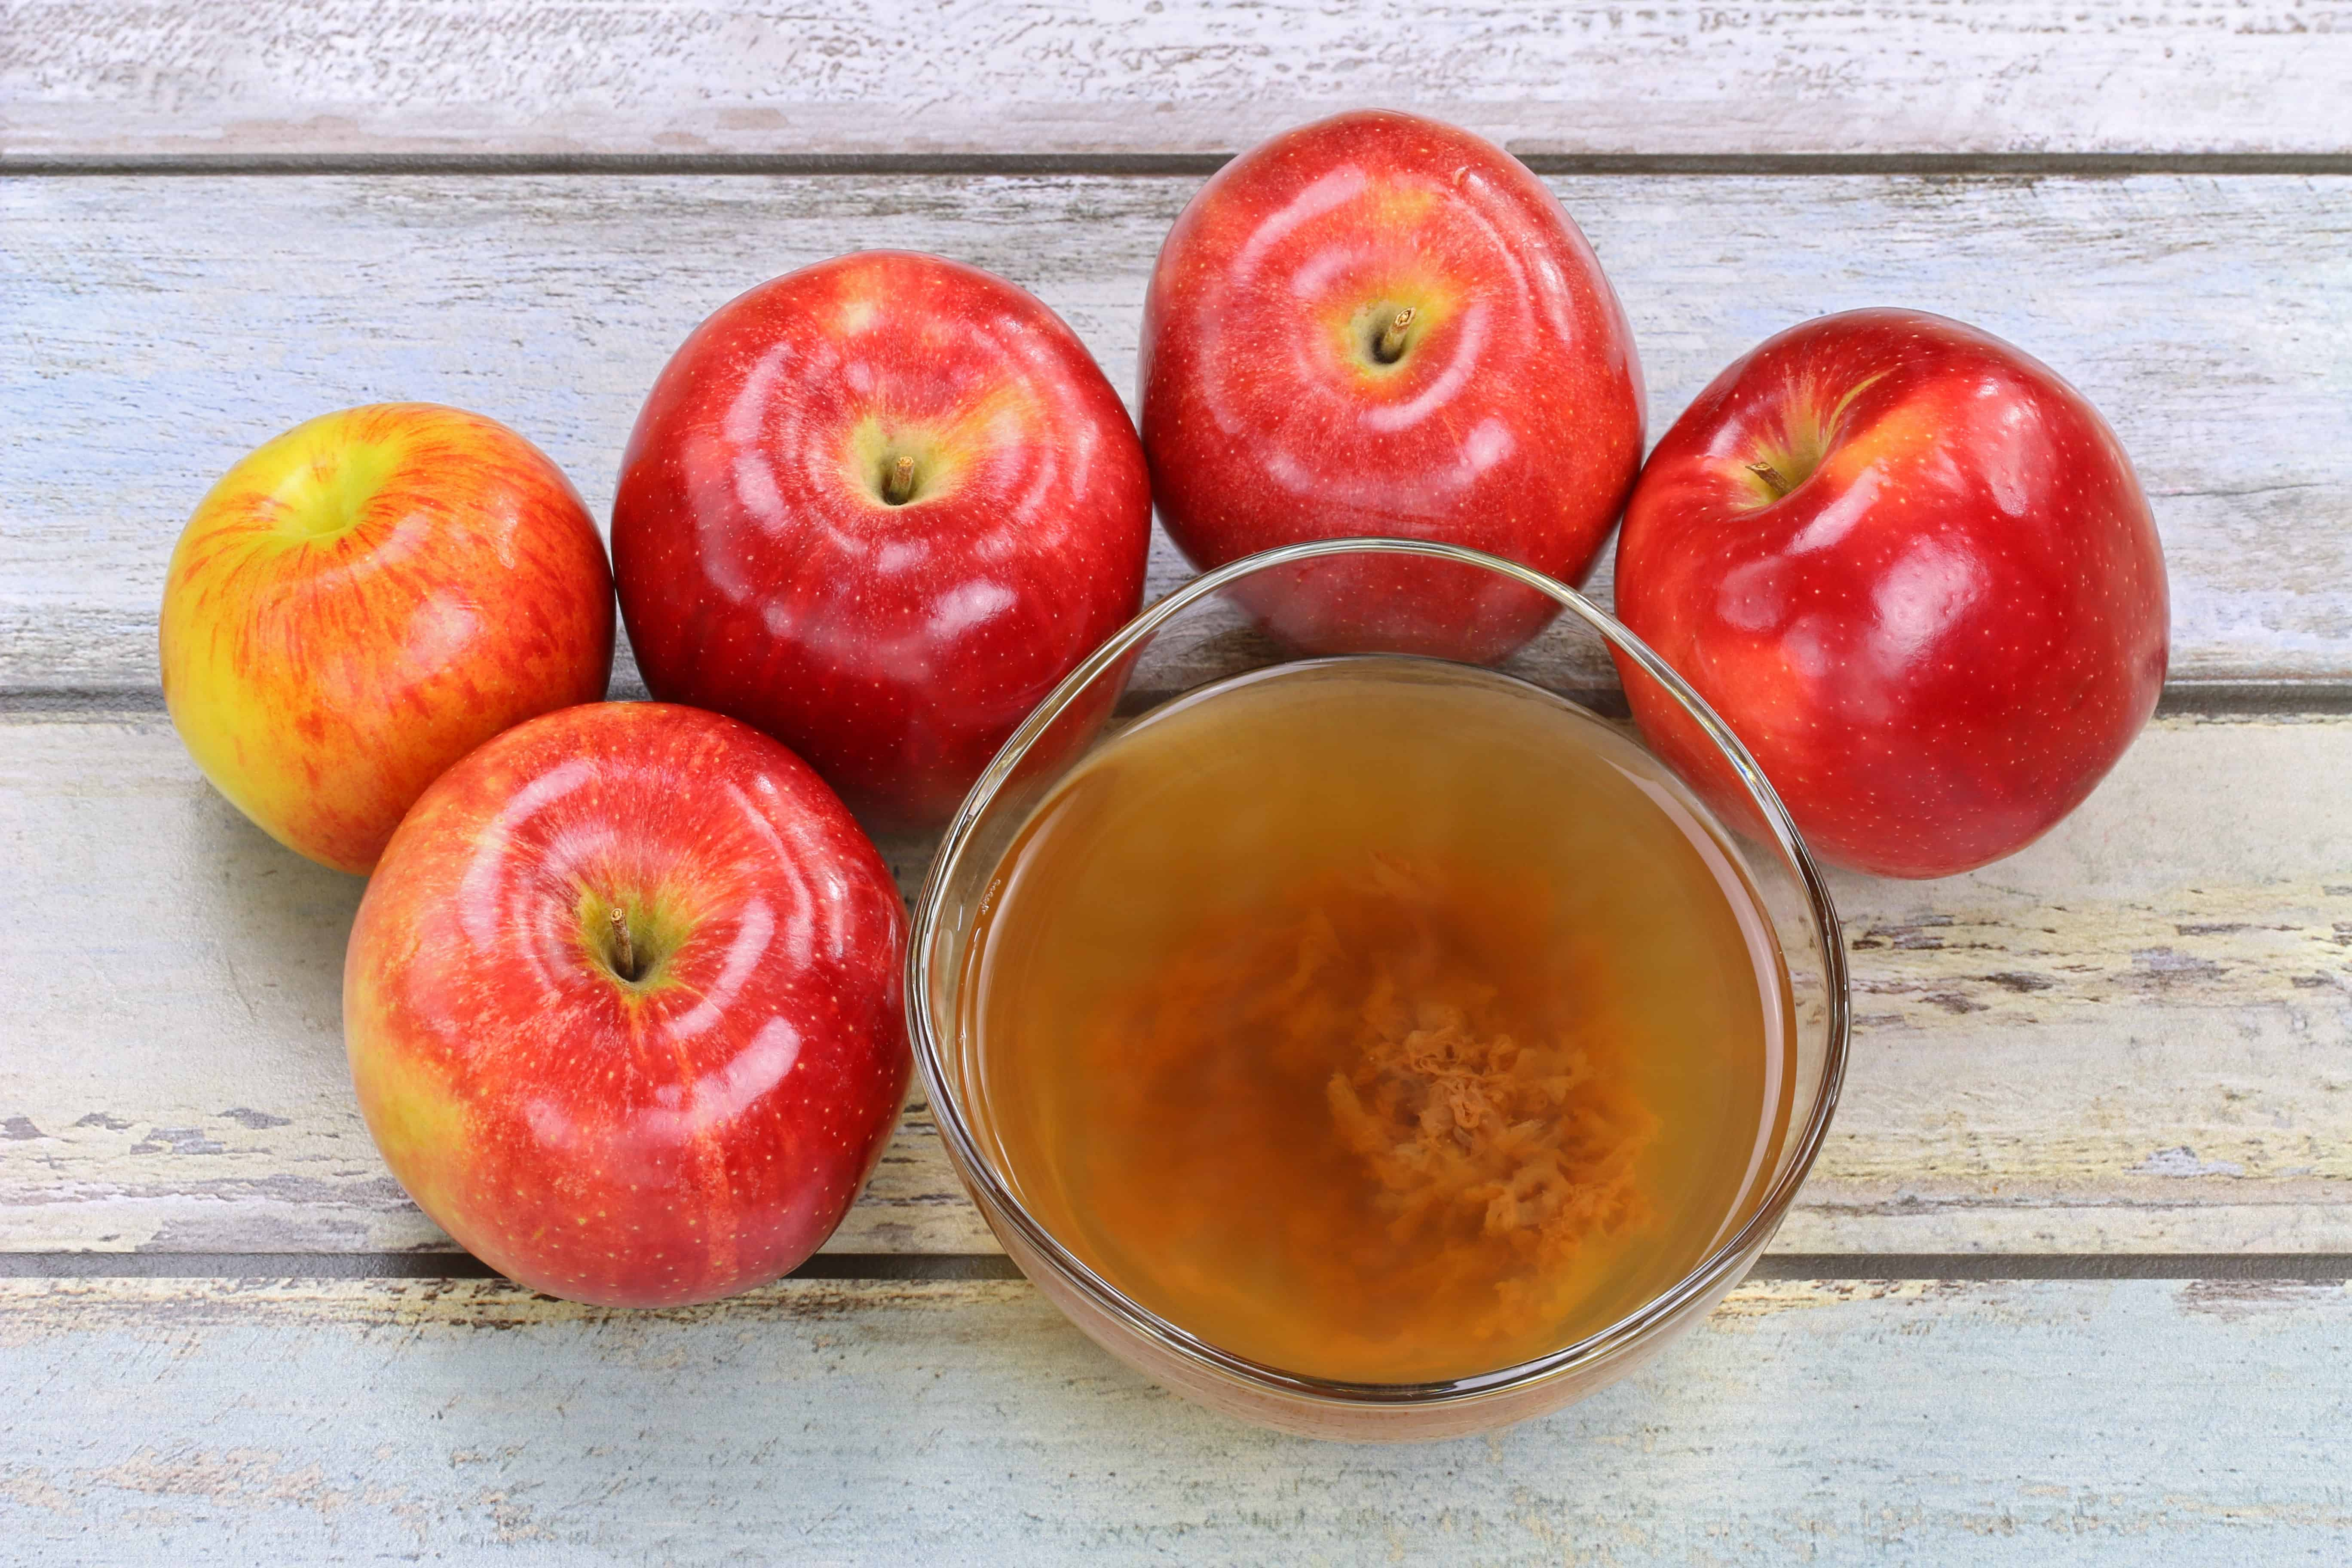 5 Great Ways to Use Apple Cider Vinegar